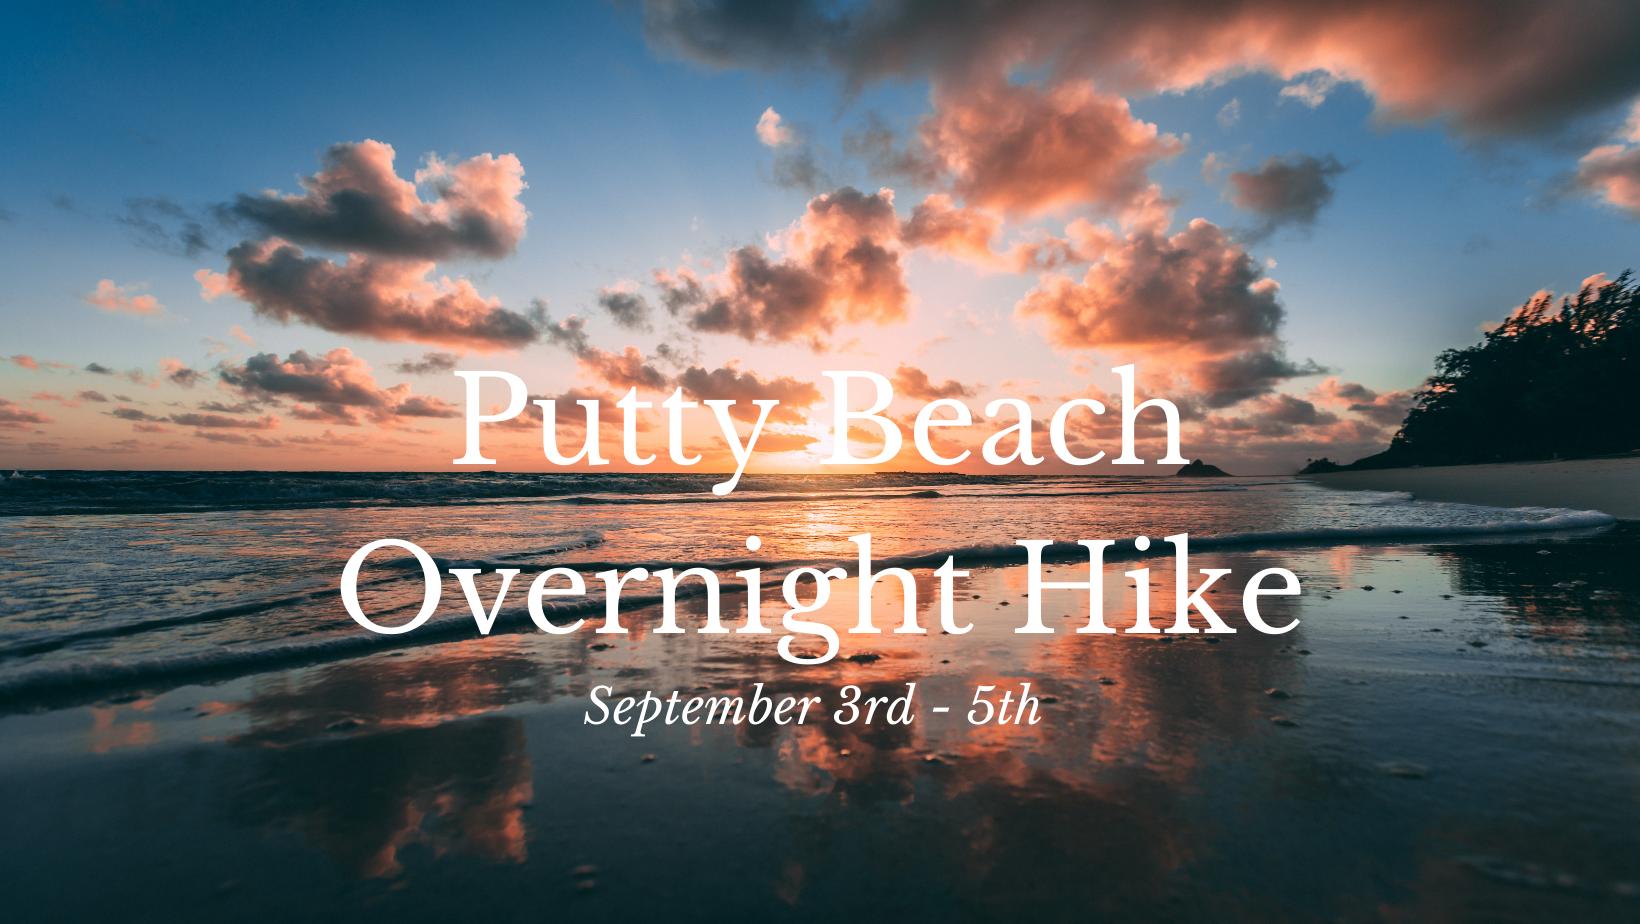 Putty Beach Overnight Hike